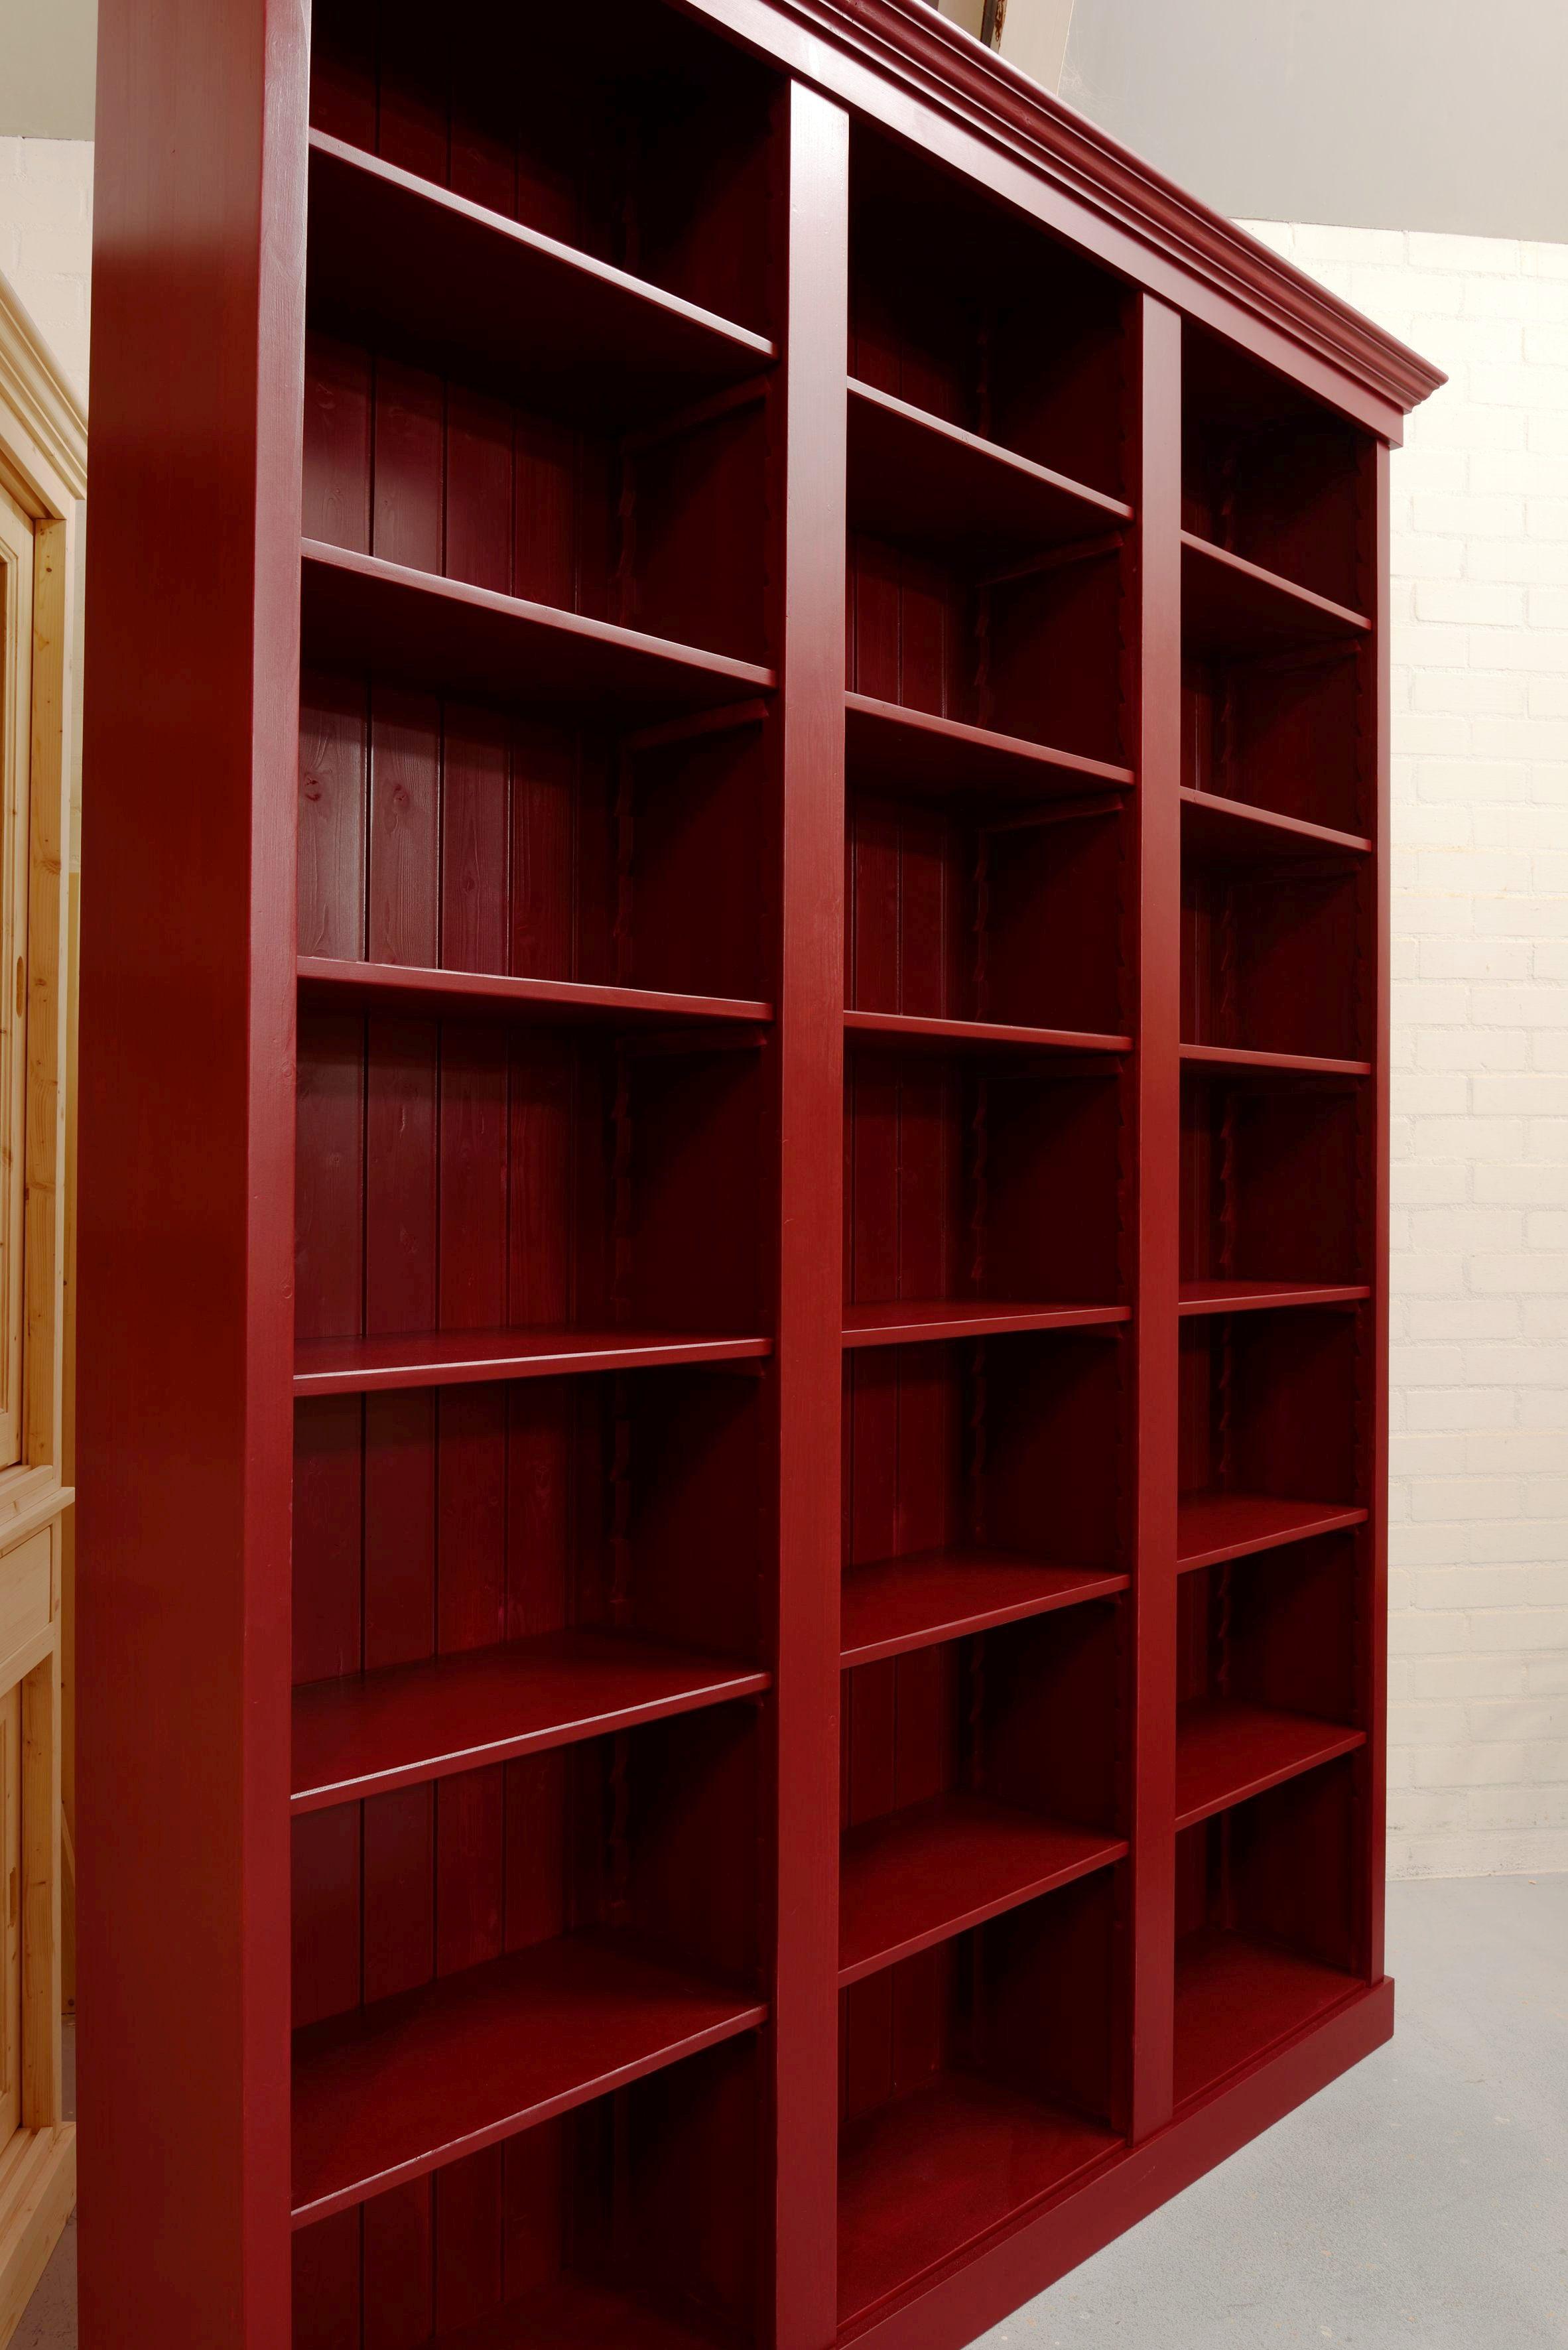 Boekenkast rood - Maatwerk in boekenkasten - de Grenenhoeve